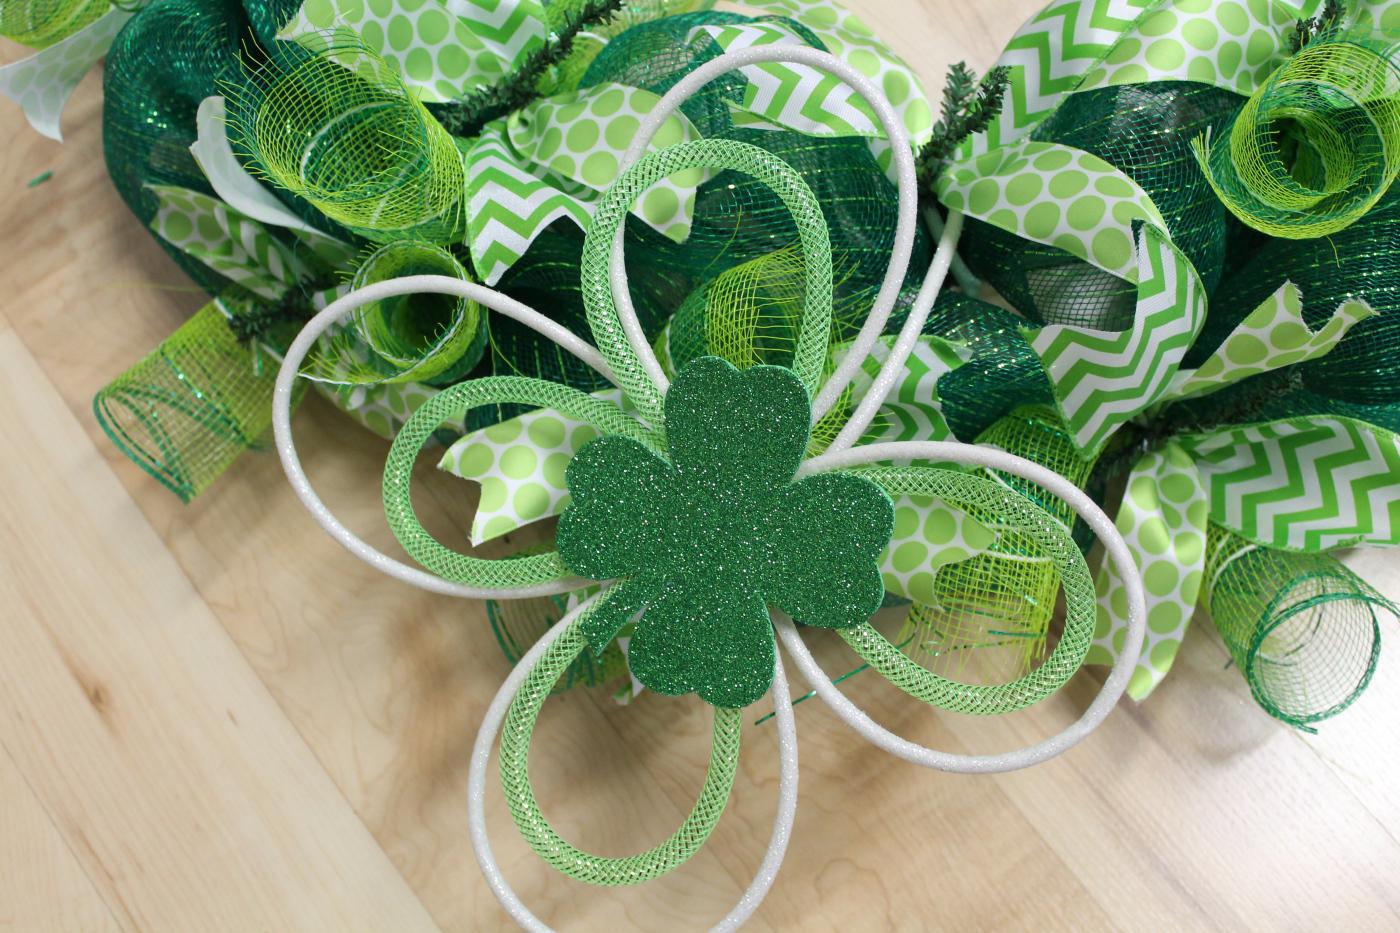 Diy Mesh St Patrick S Day Wreath The Wreath Depot